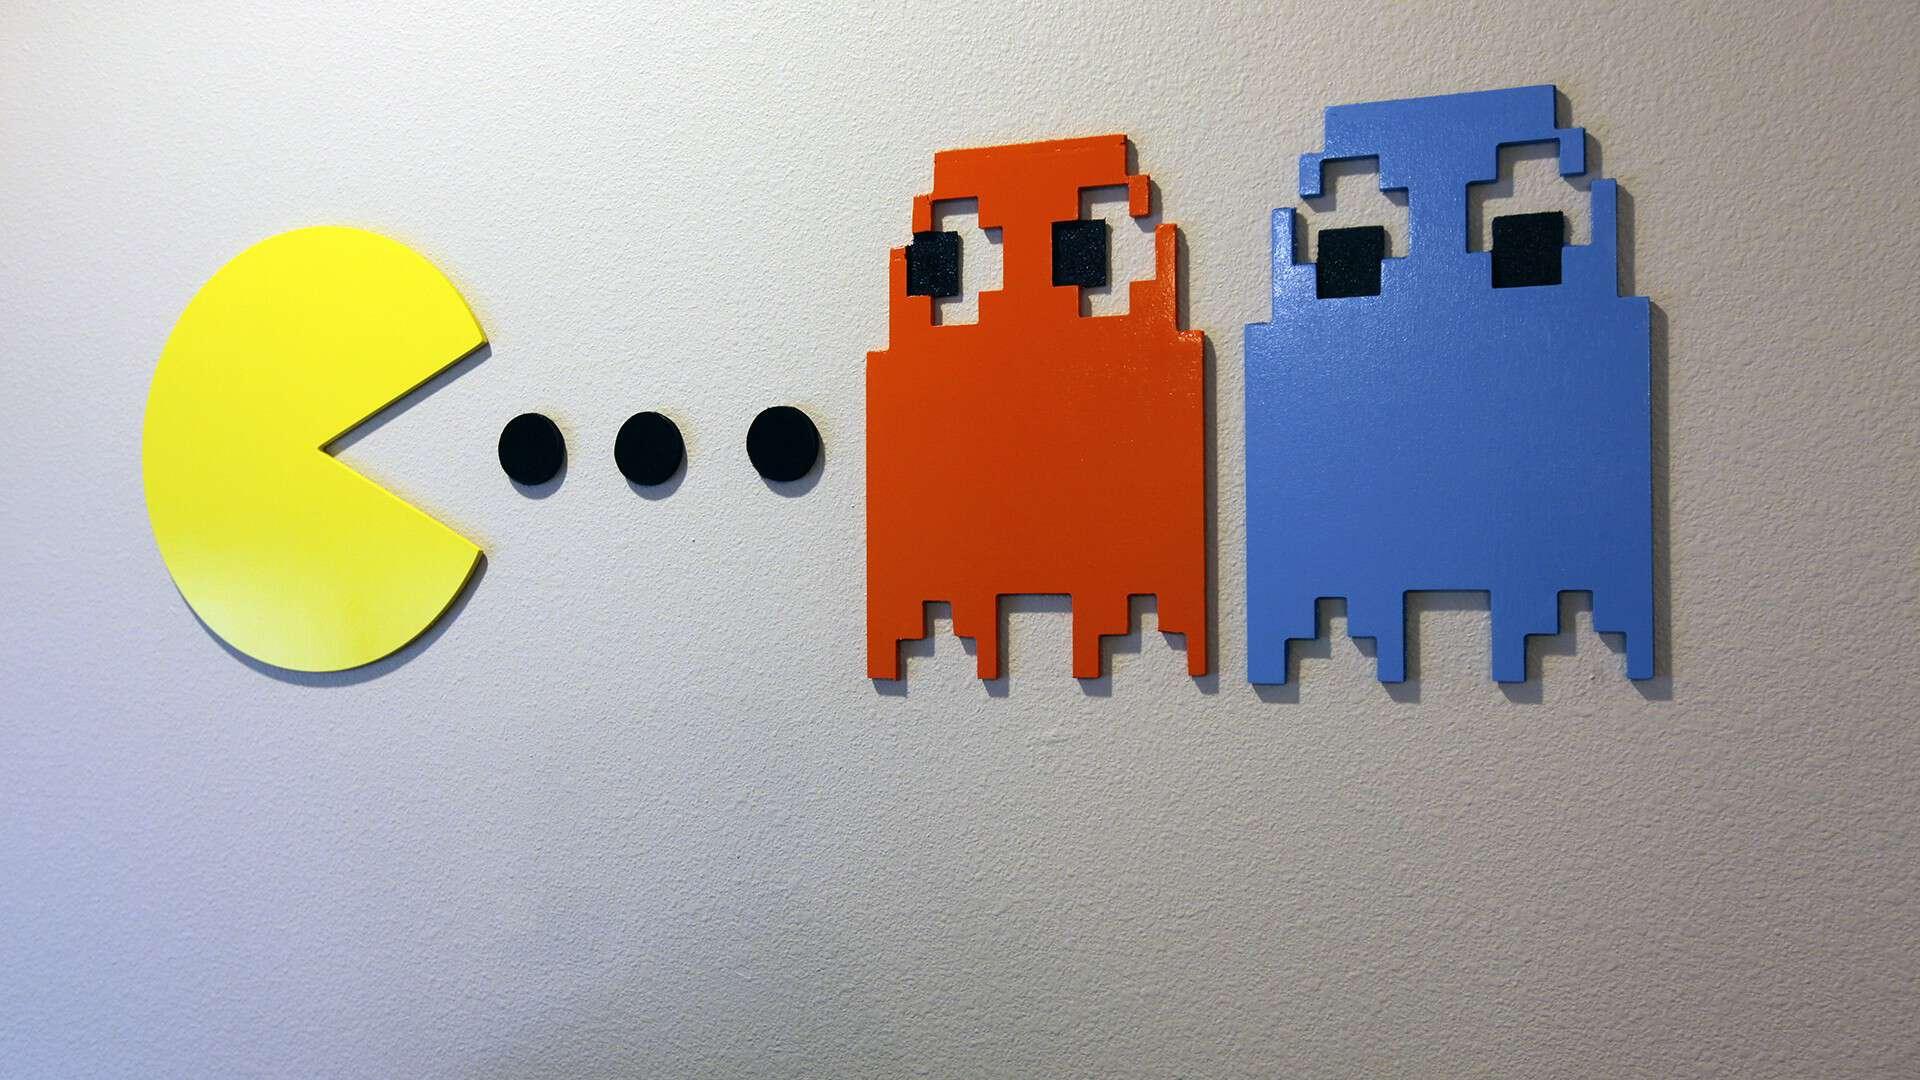 Pac-Man Wall Art - blog-hero